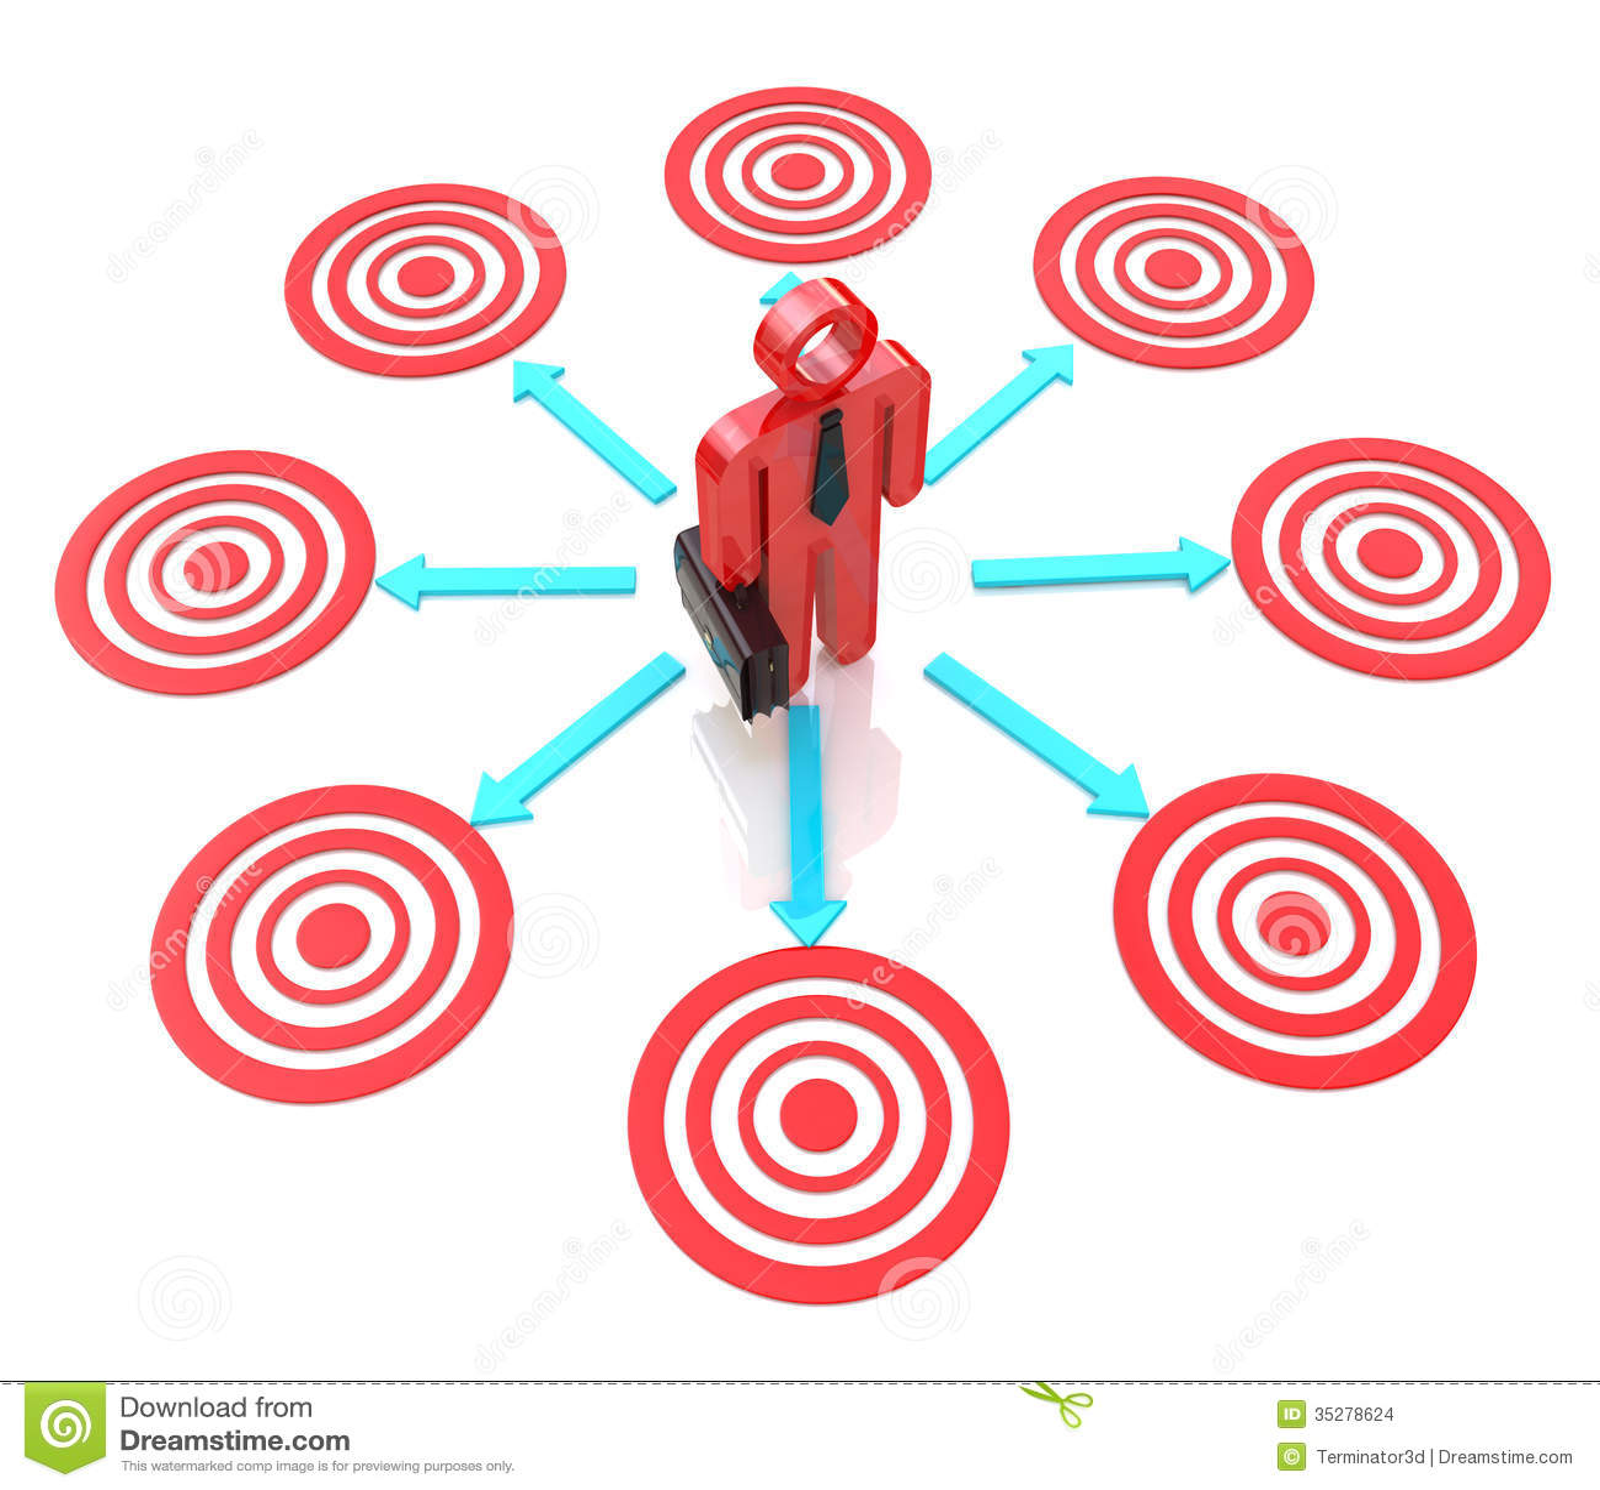 Target Corp in Retailing